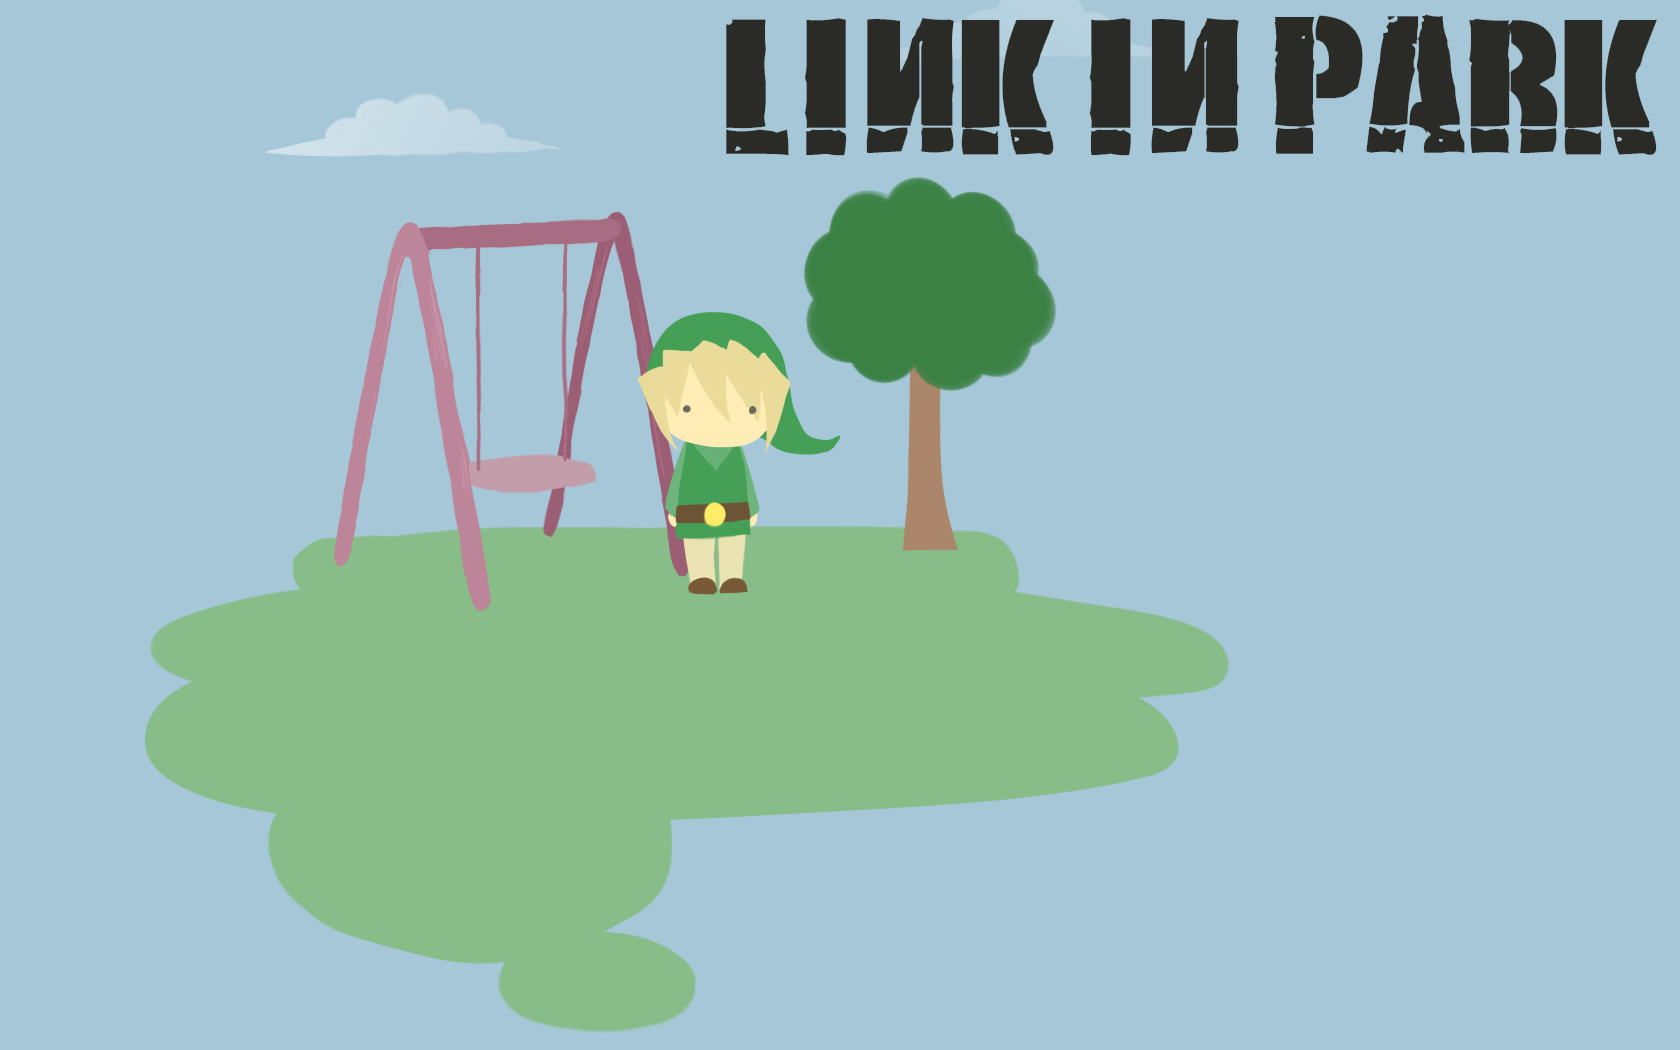 General 1680x1050 Link Linkin Park artwork swings humor video games The Legend of Zelda video game art Video Game Heroes trees simple background blue background music